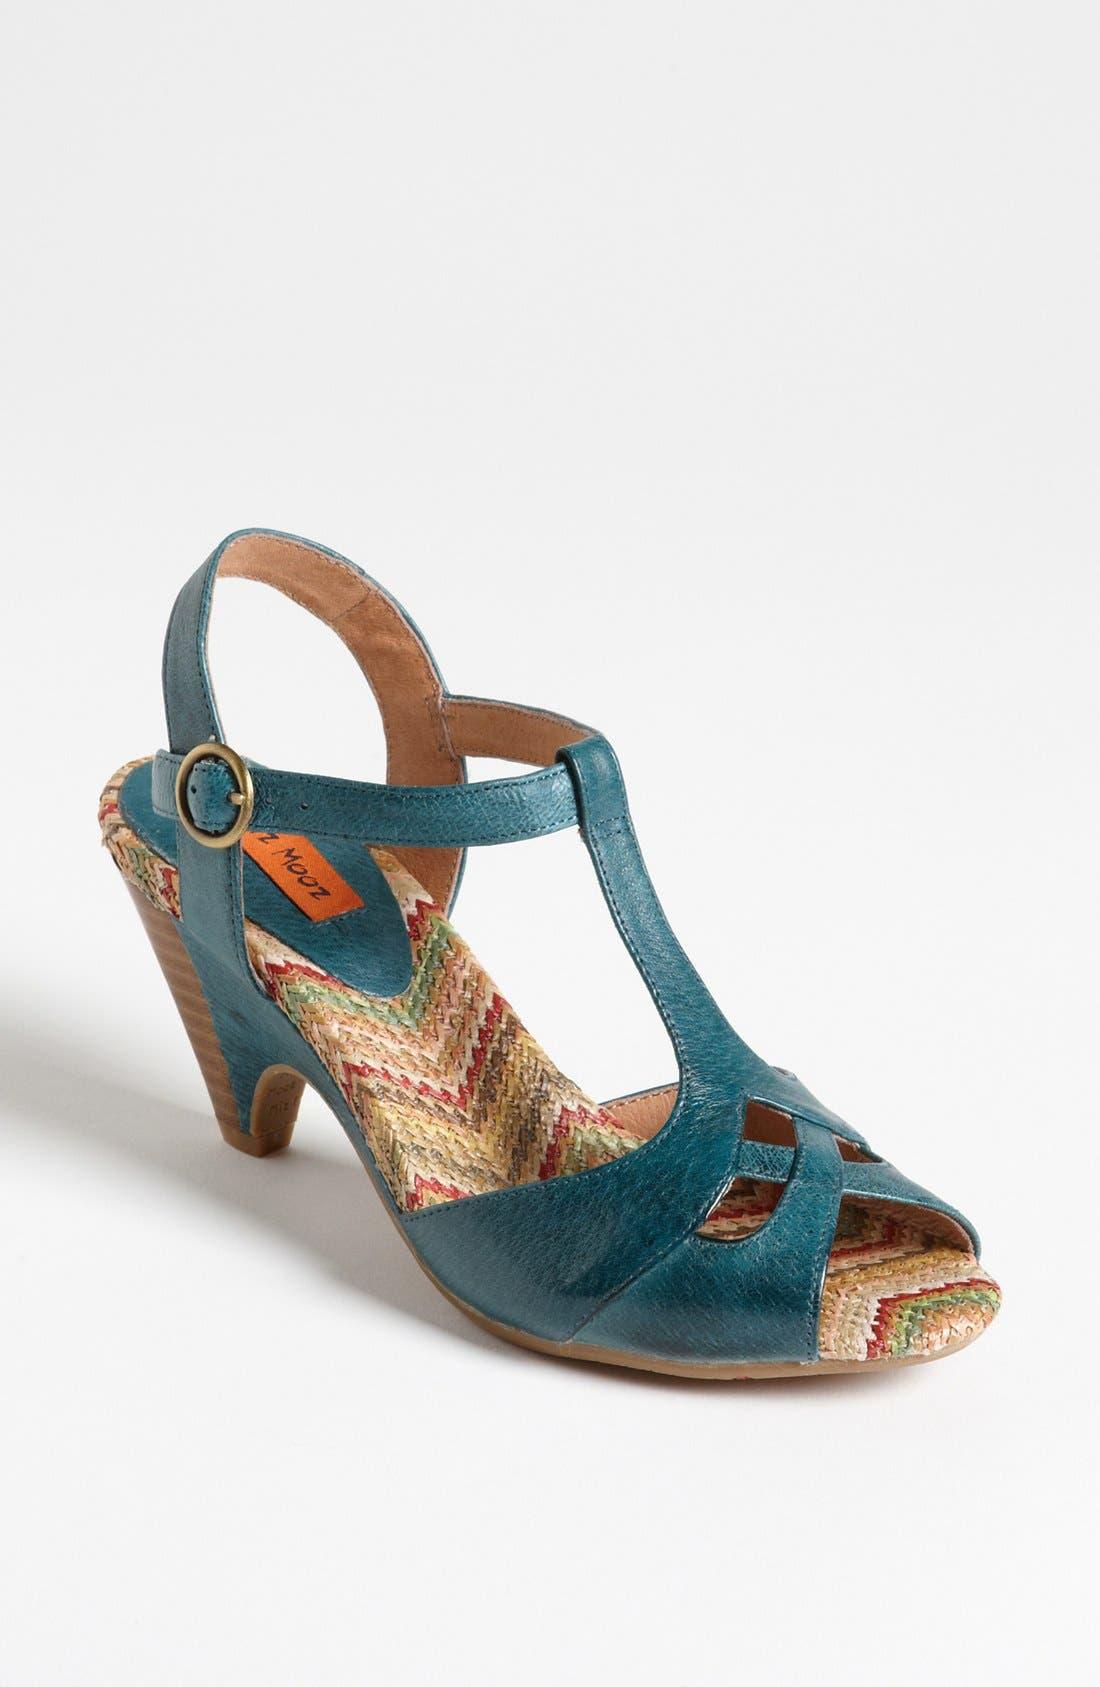 Alternate Image 1 Selected - Miz Mooz 'Waltz' Sandal